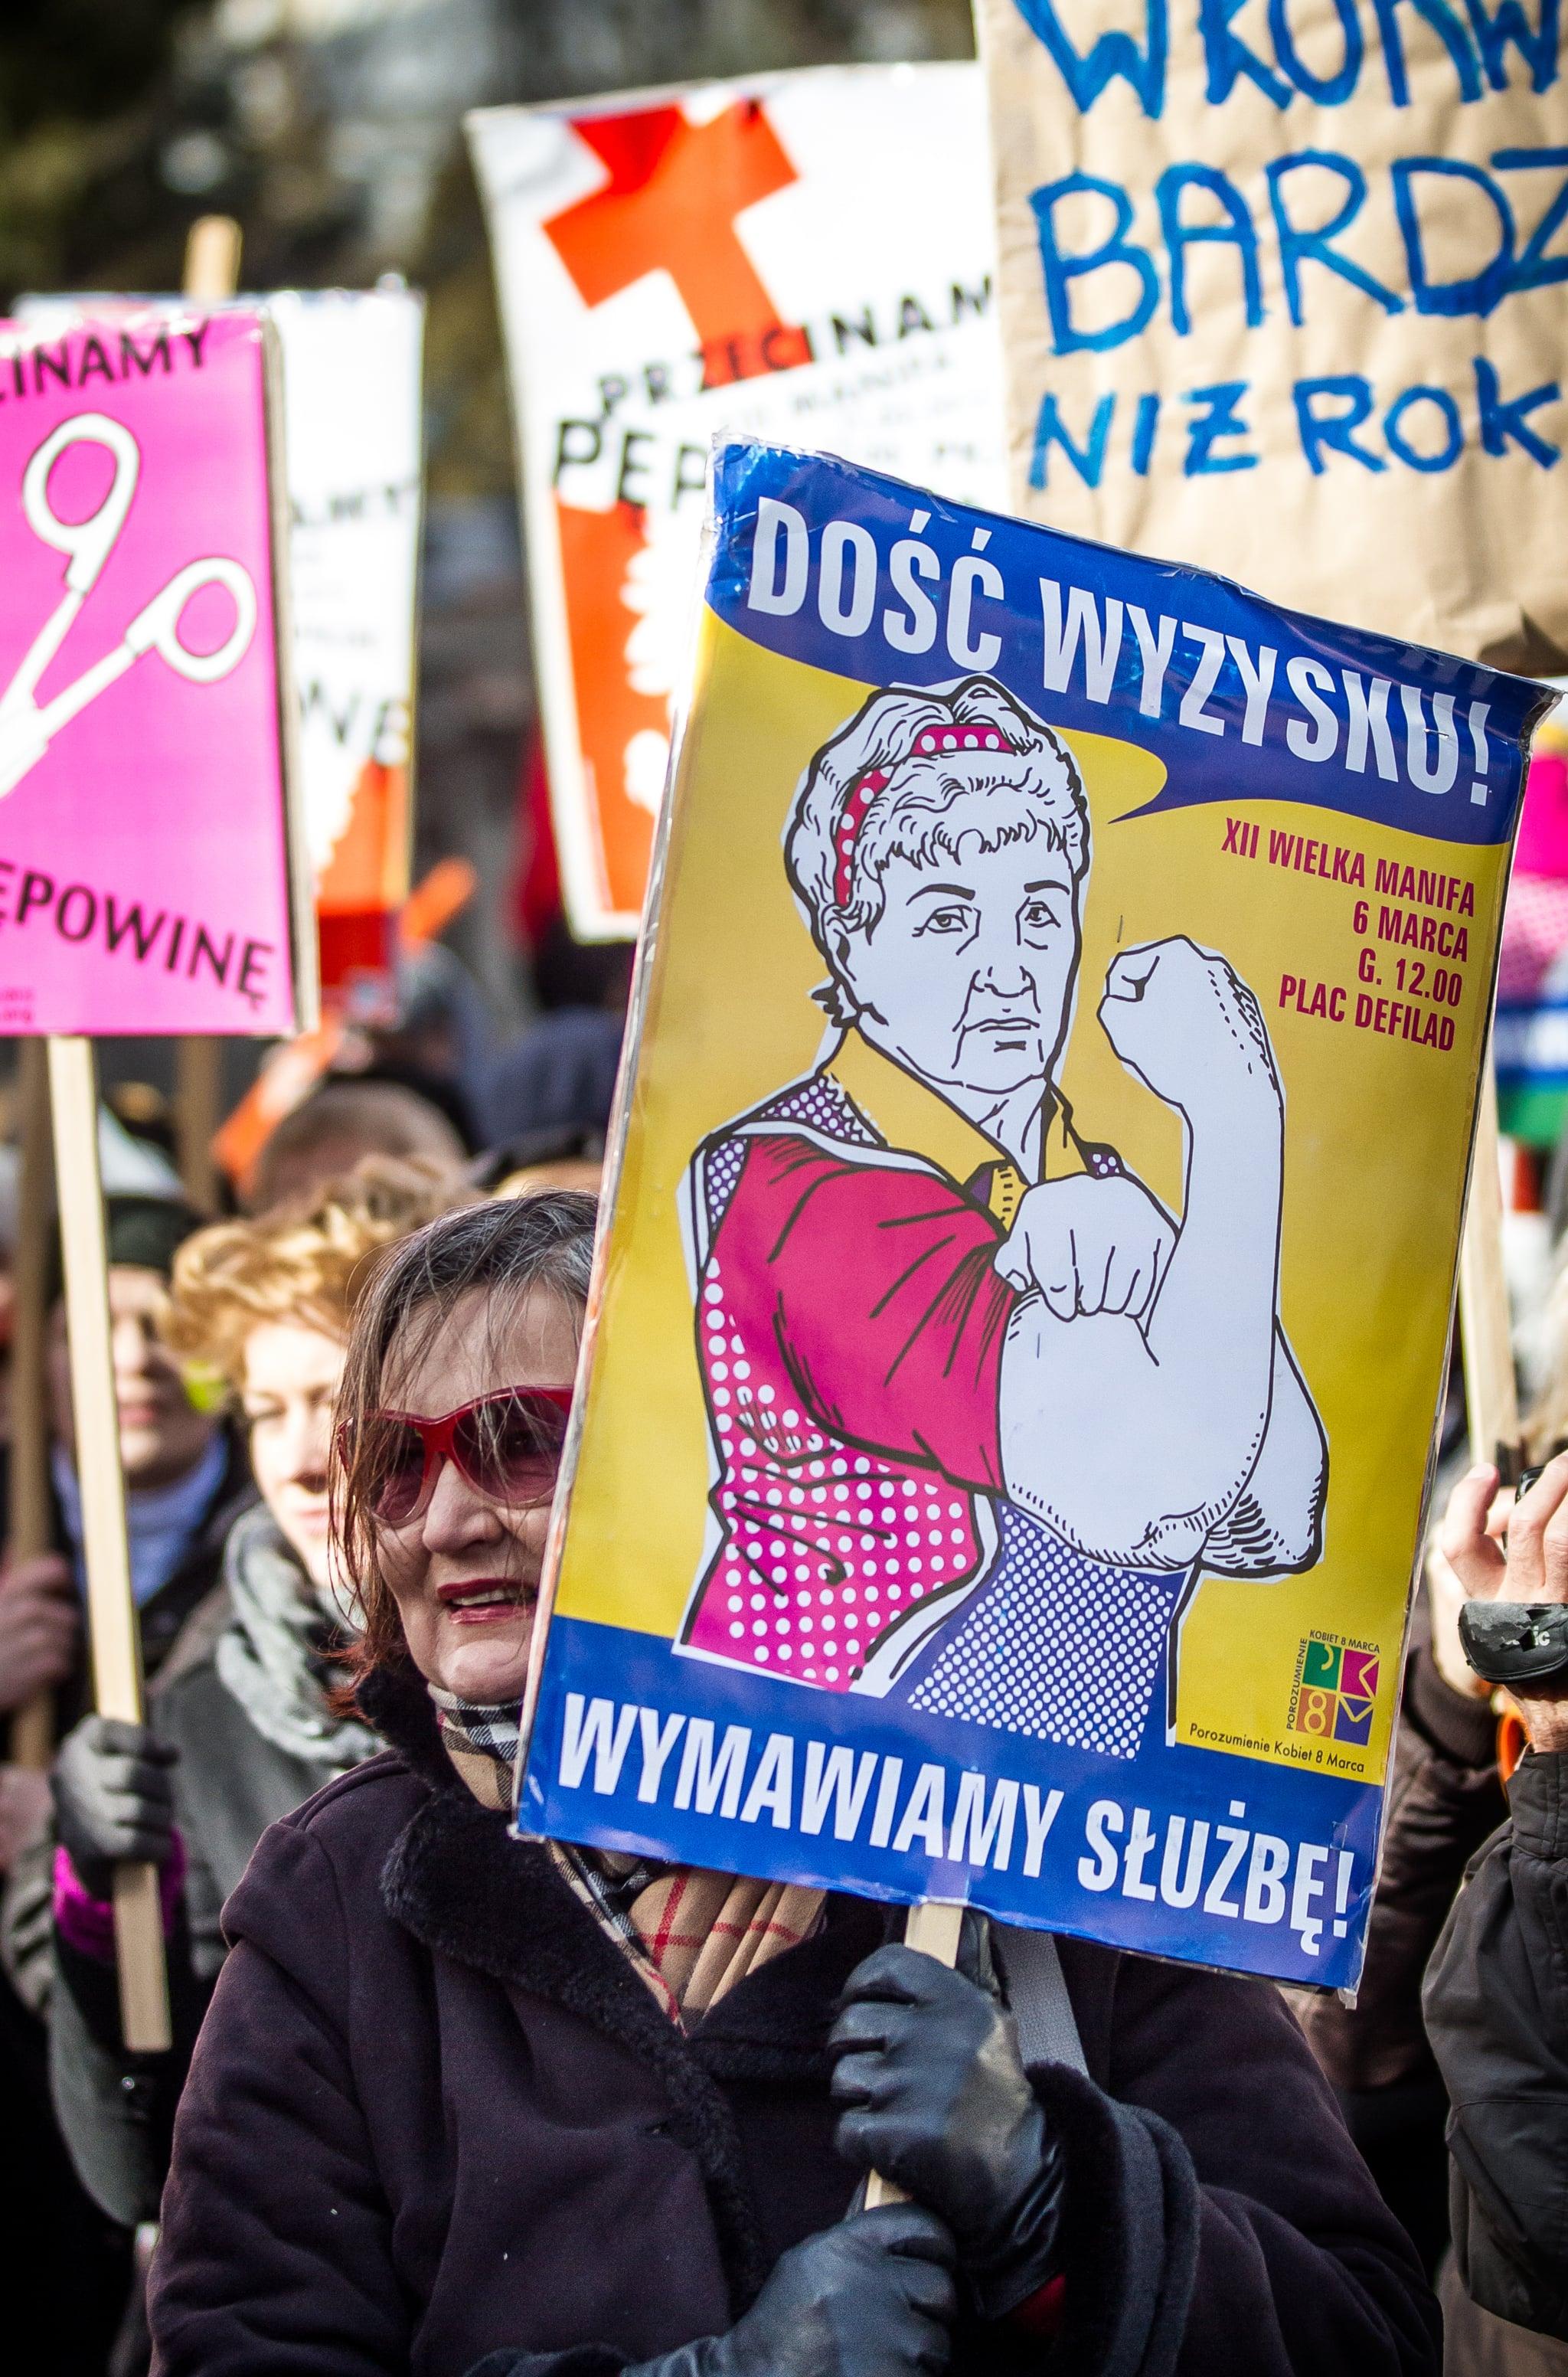 International Women's Day in Poland, 2012